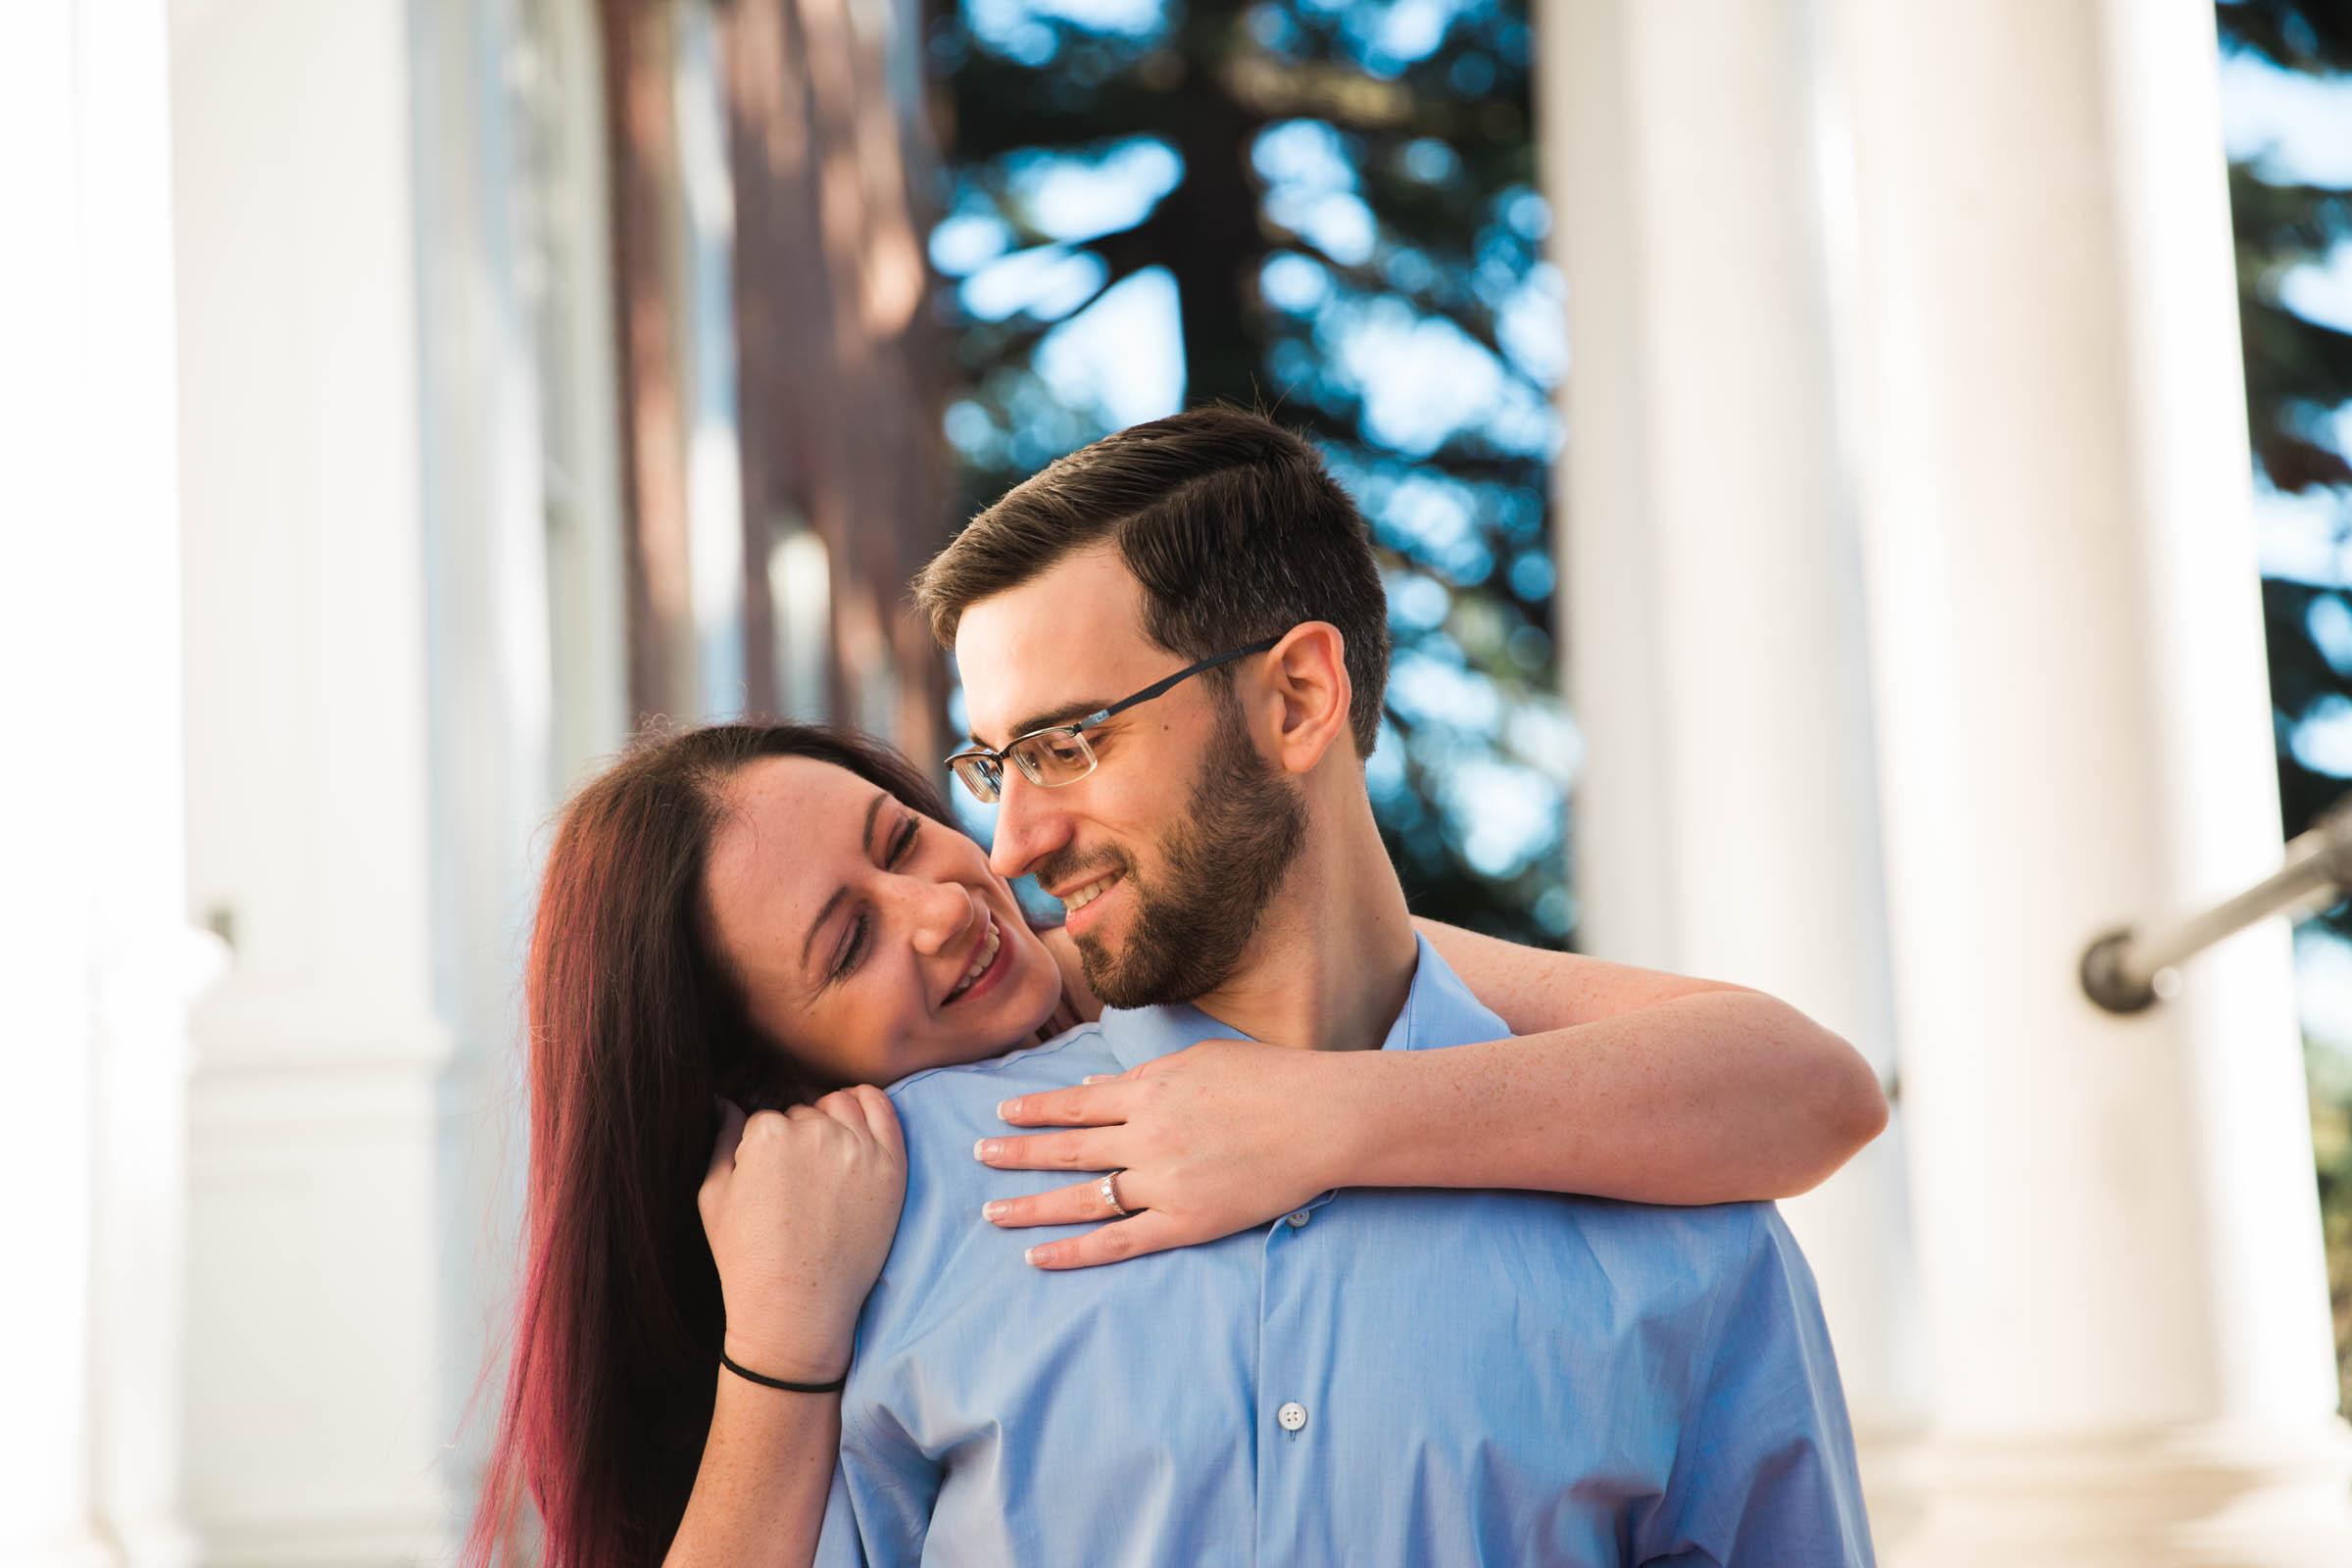 Annapolis Elopement Engagement Photography Megapixels Media Photography Maryland Photographer (11 of 22).jpg